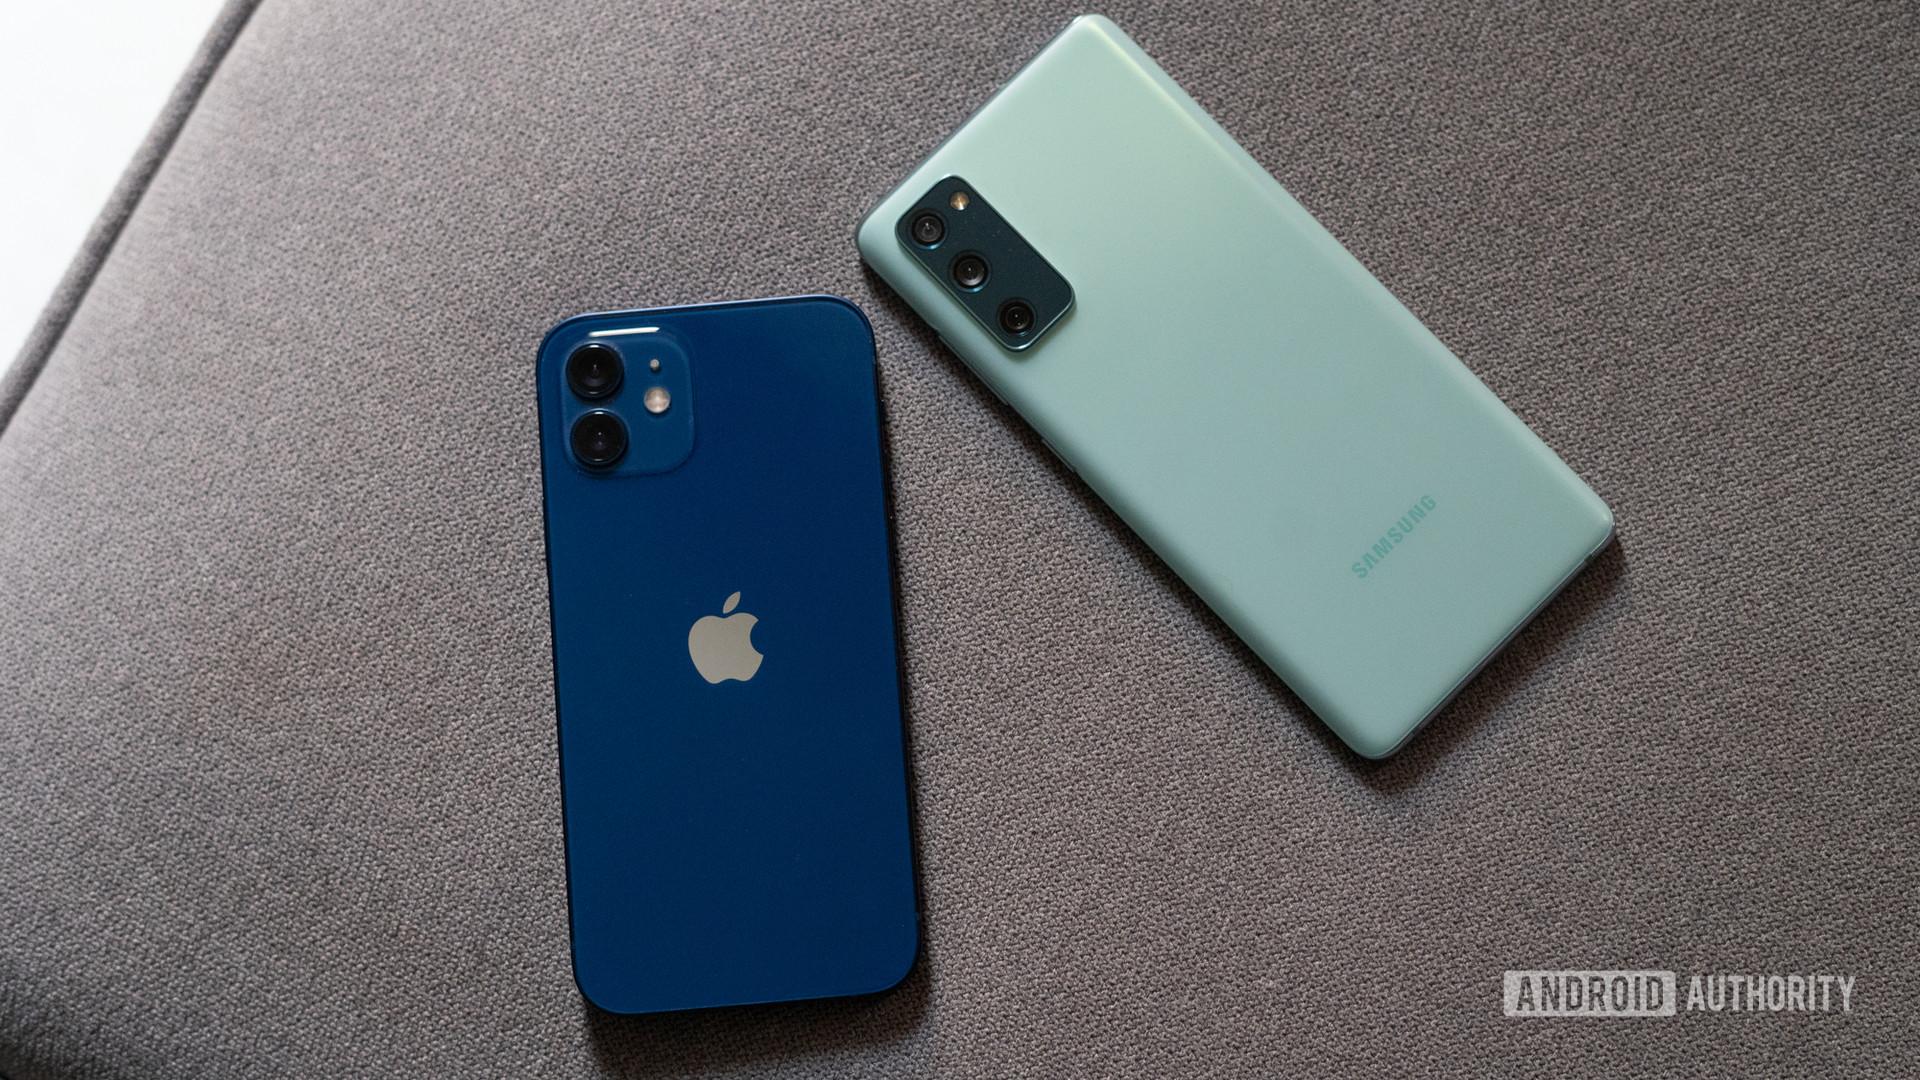 iPhone 12 vs Samsung Galaxy S20 FE top down